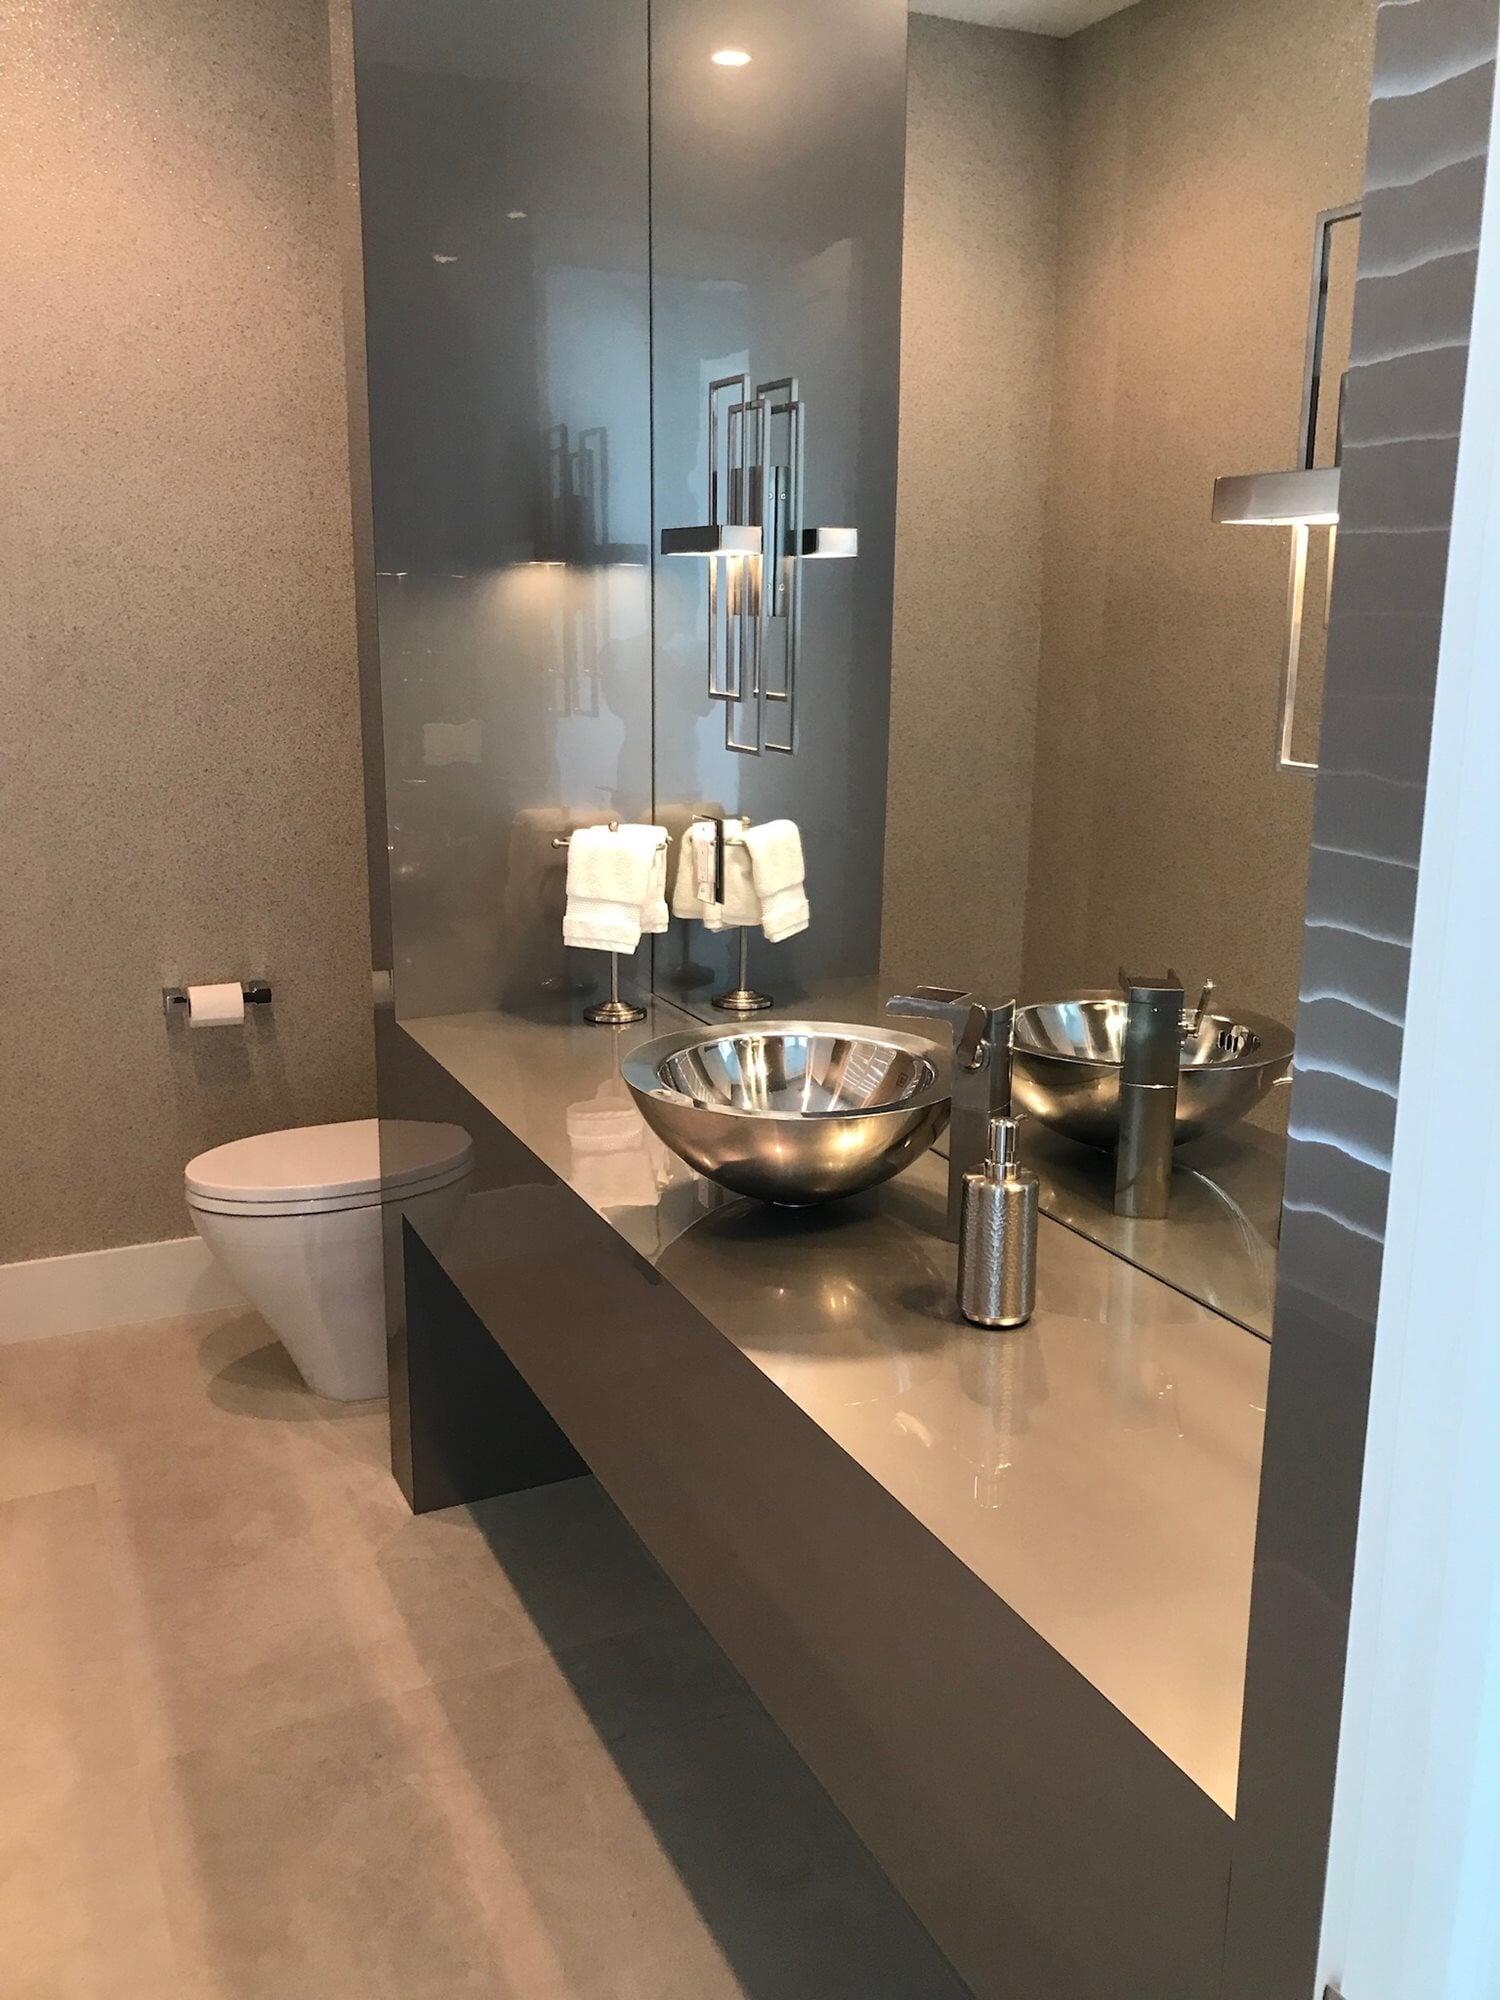 Custom bathroom vanity in Juno Beach, FL from Floors For You Kitchen & Bath